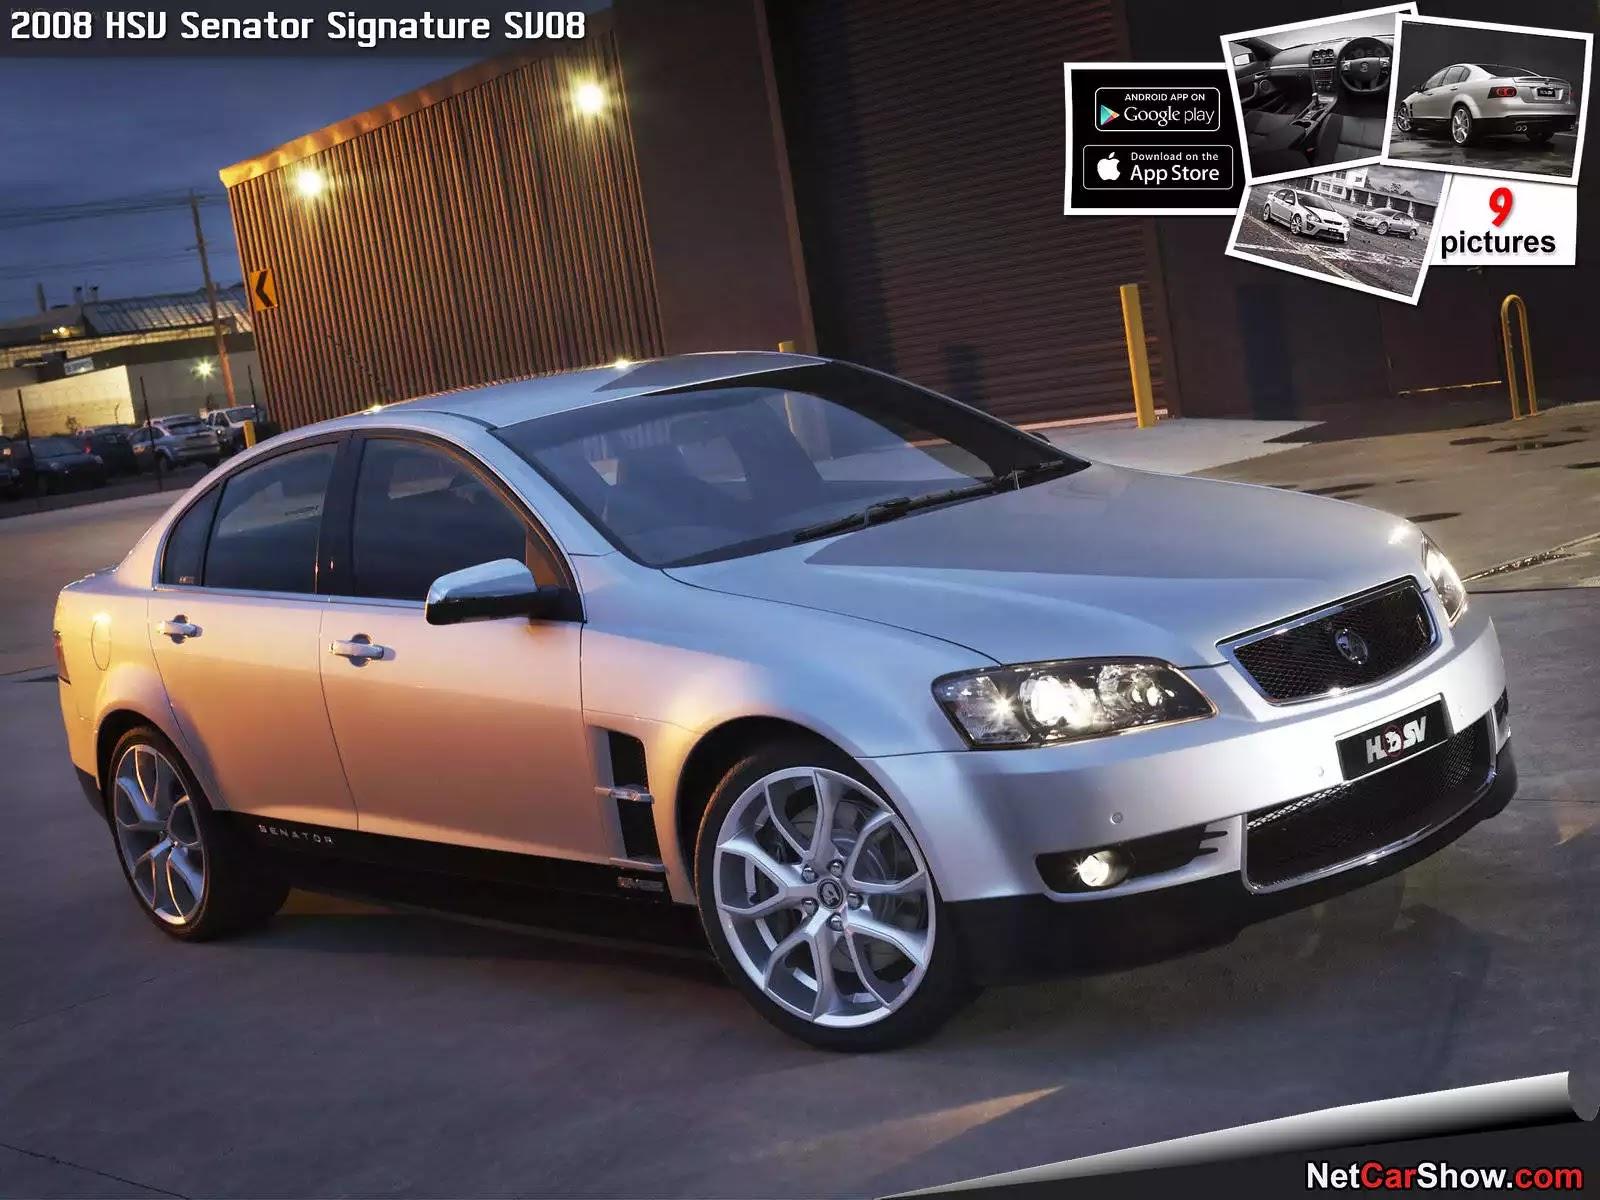 Hình ảnh xe ô tô HSV Senator Signature SV08 2008 & nội ngoại thất